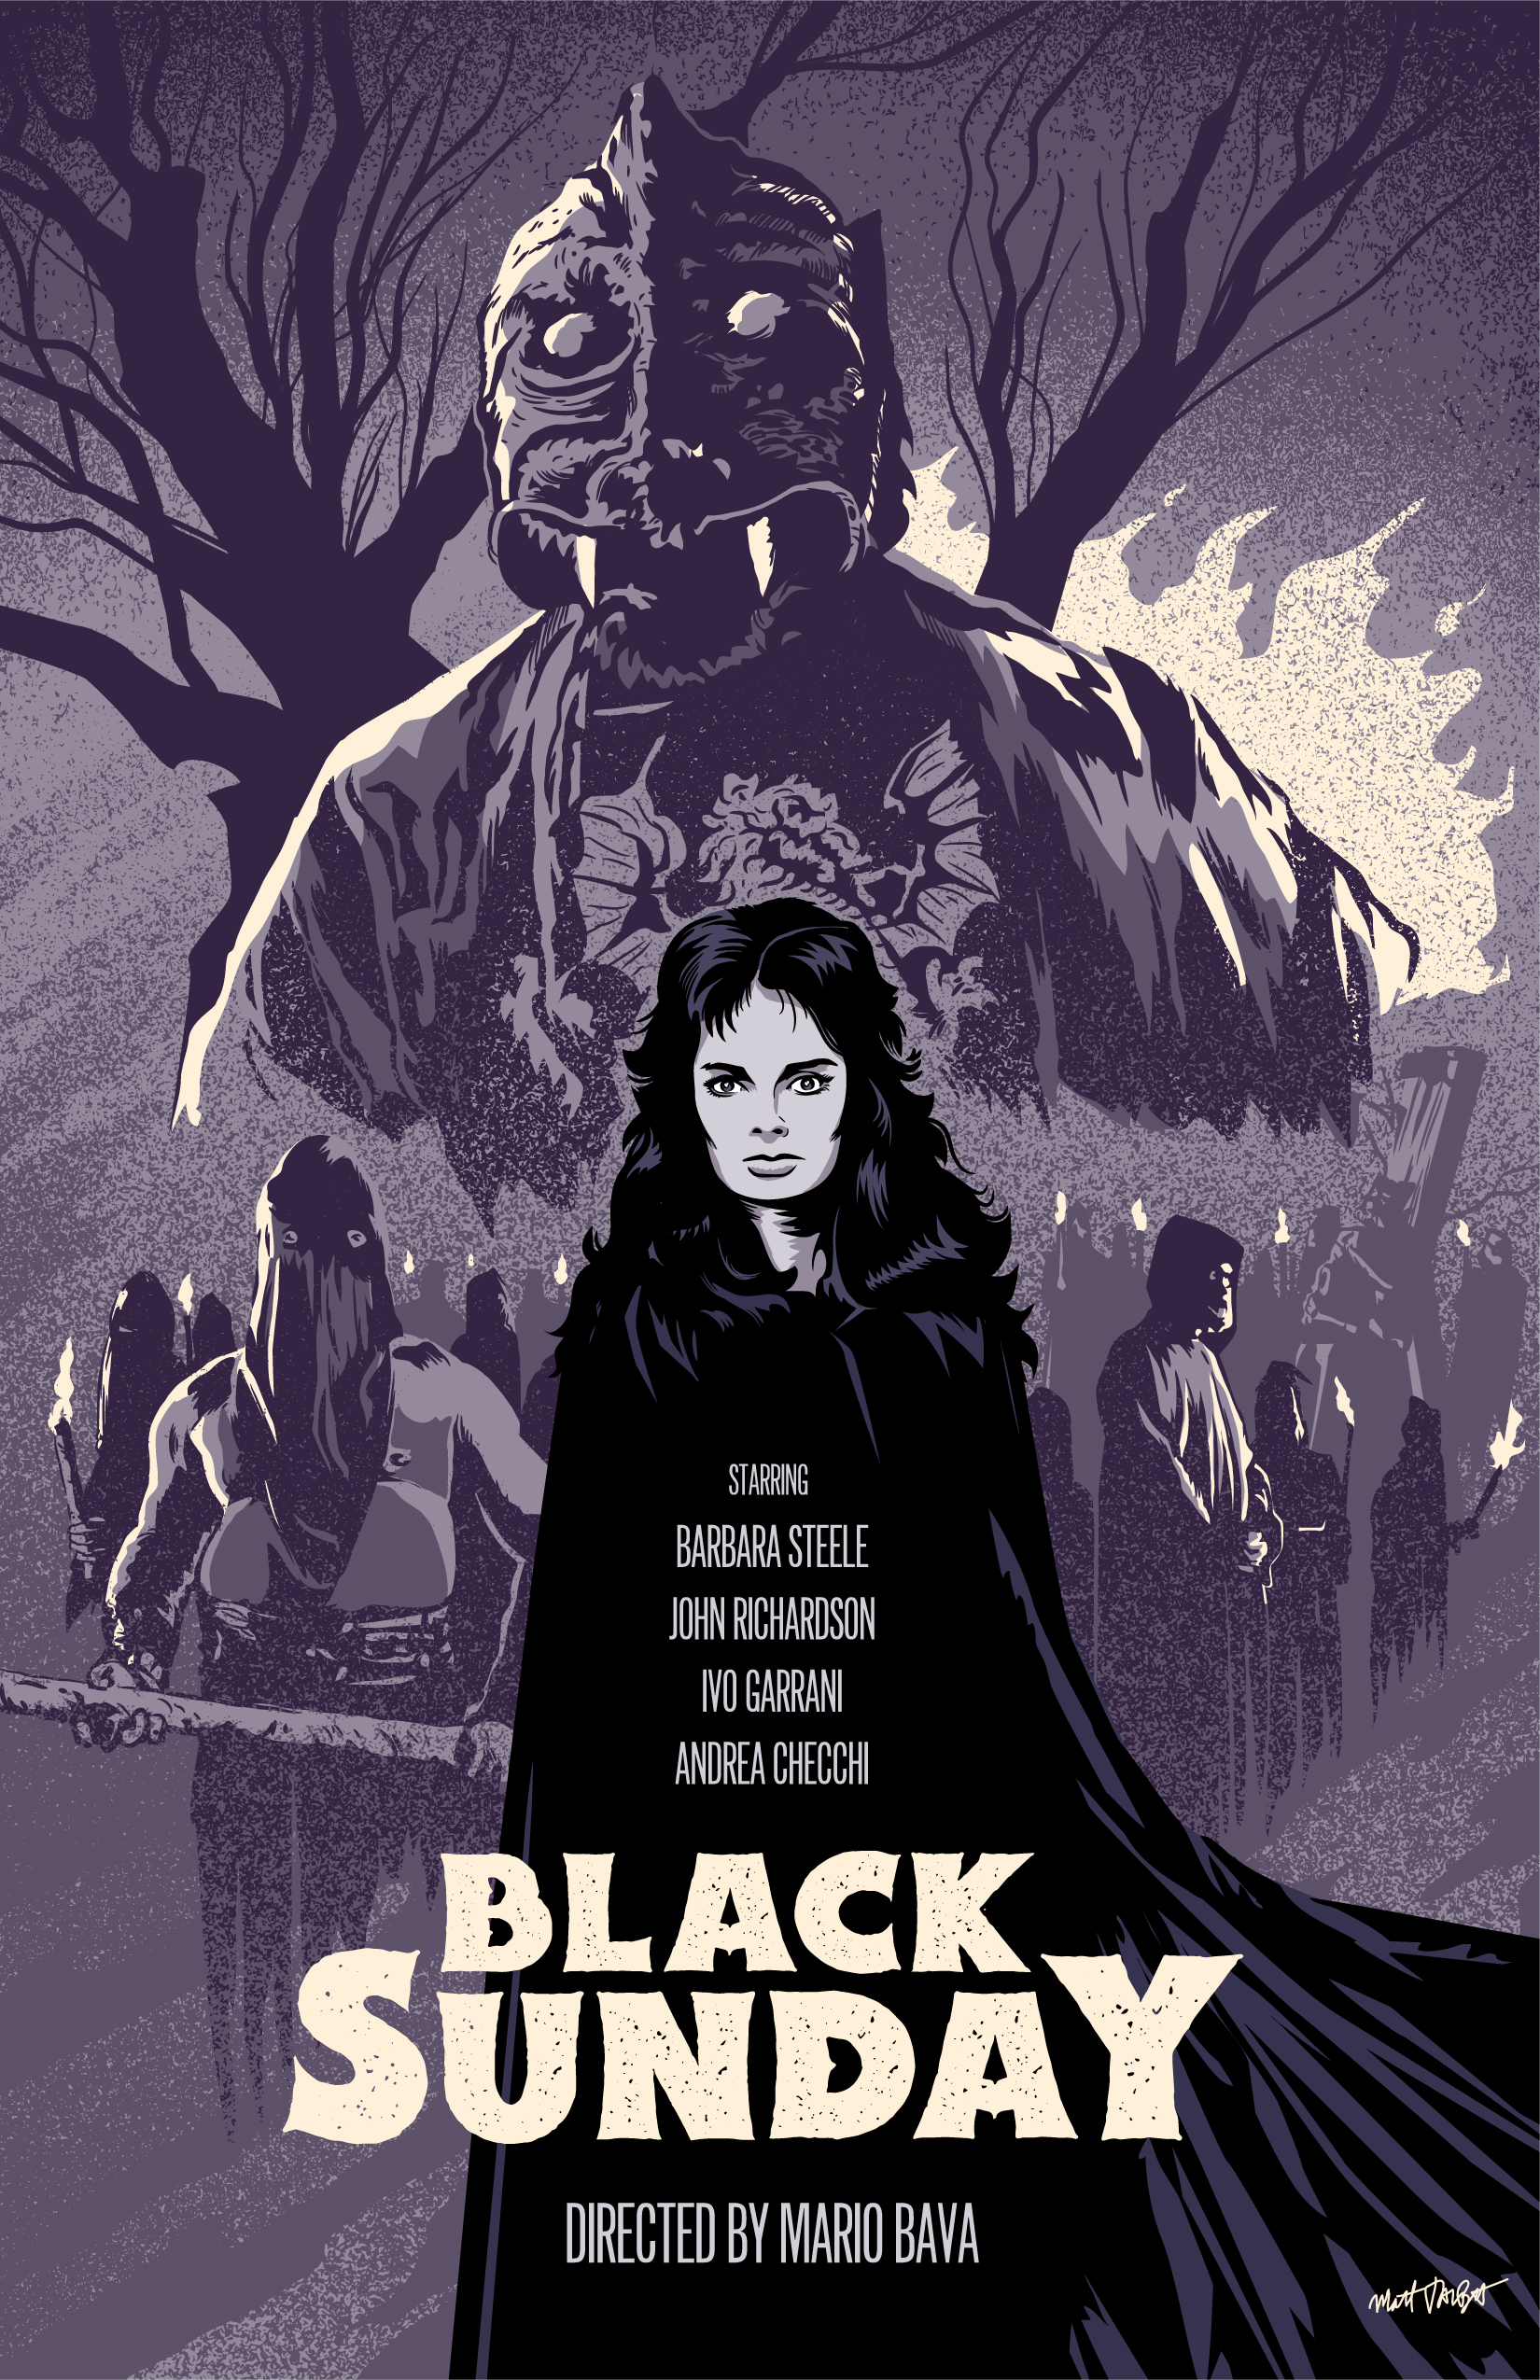 Black Sunday Poster by Matt Talbot